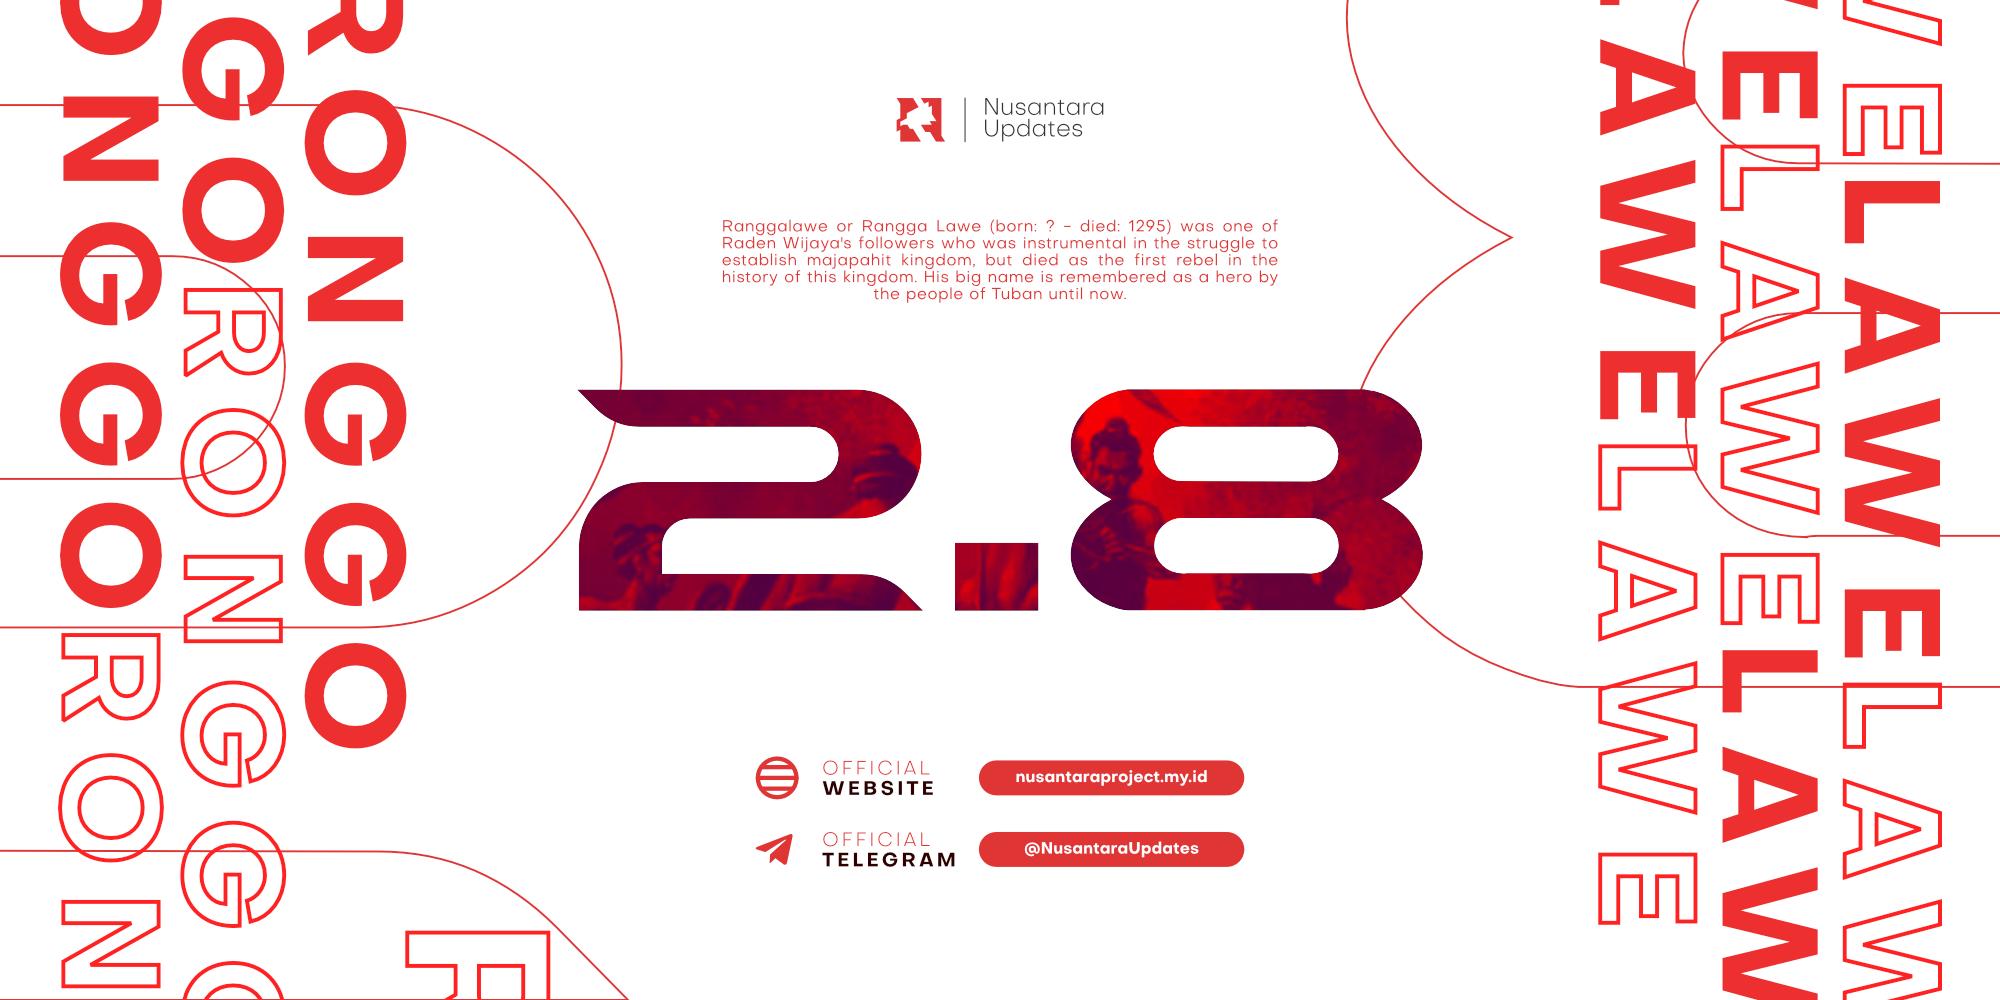 [ROM] NusantaraProject - v2.8 Ranggalawe [Mi 6][Sagit]